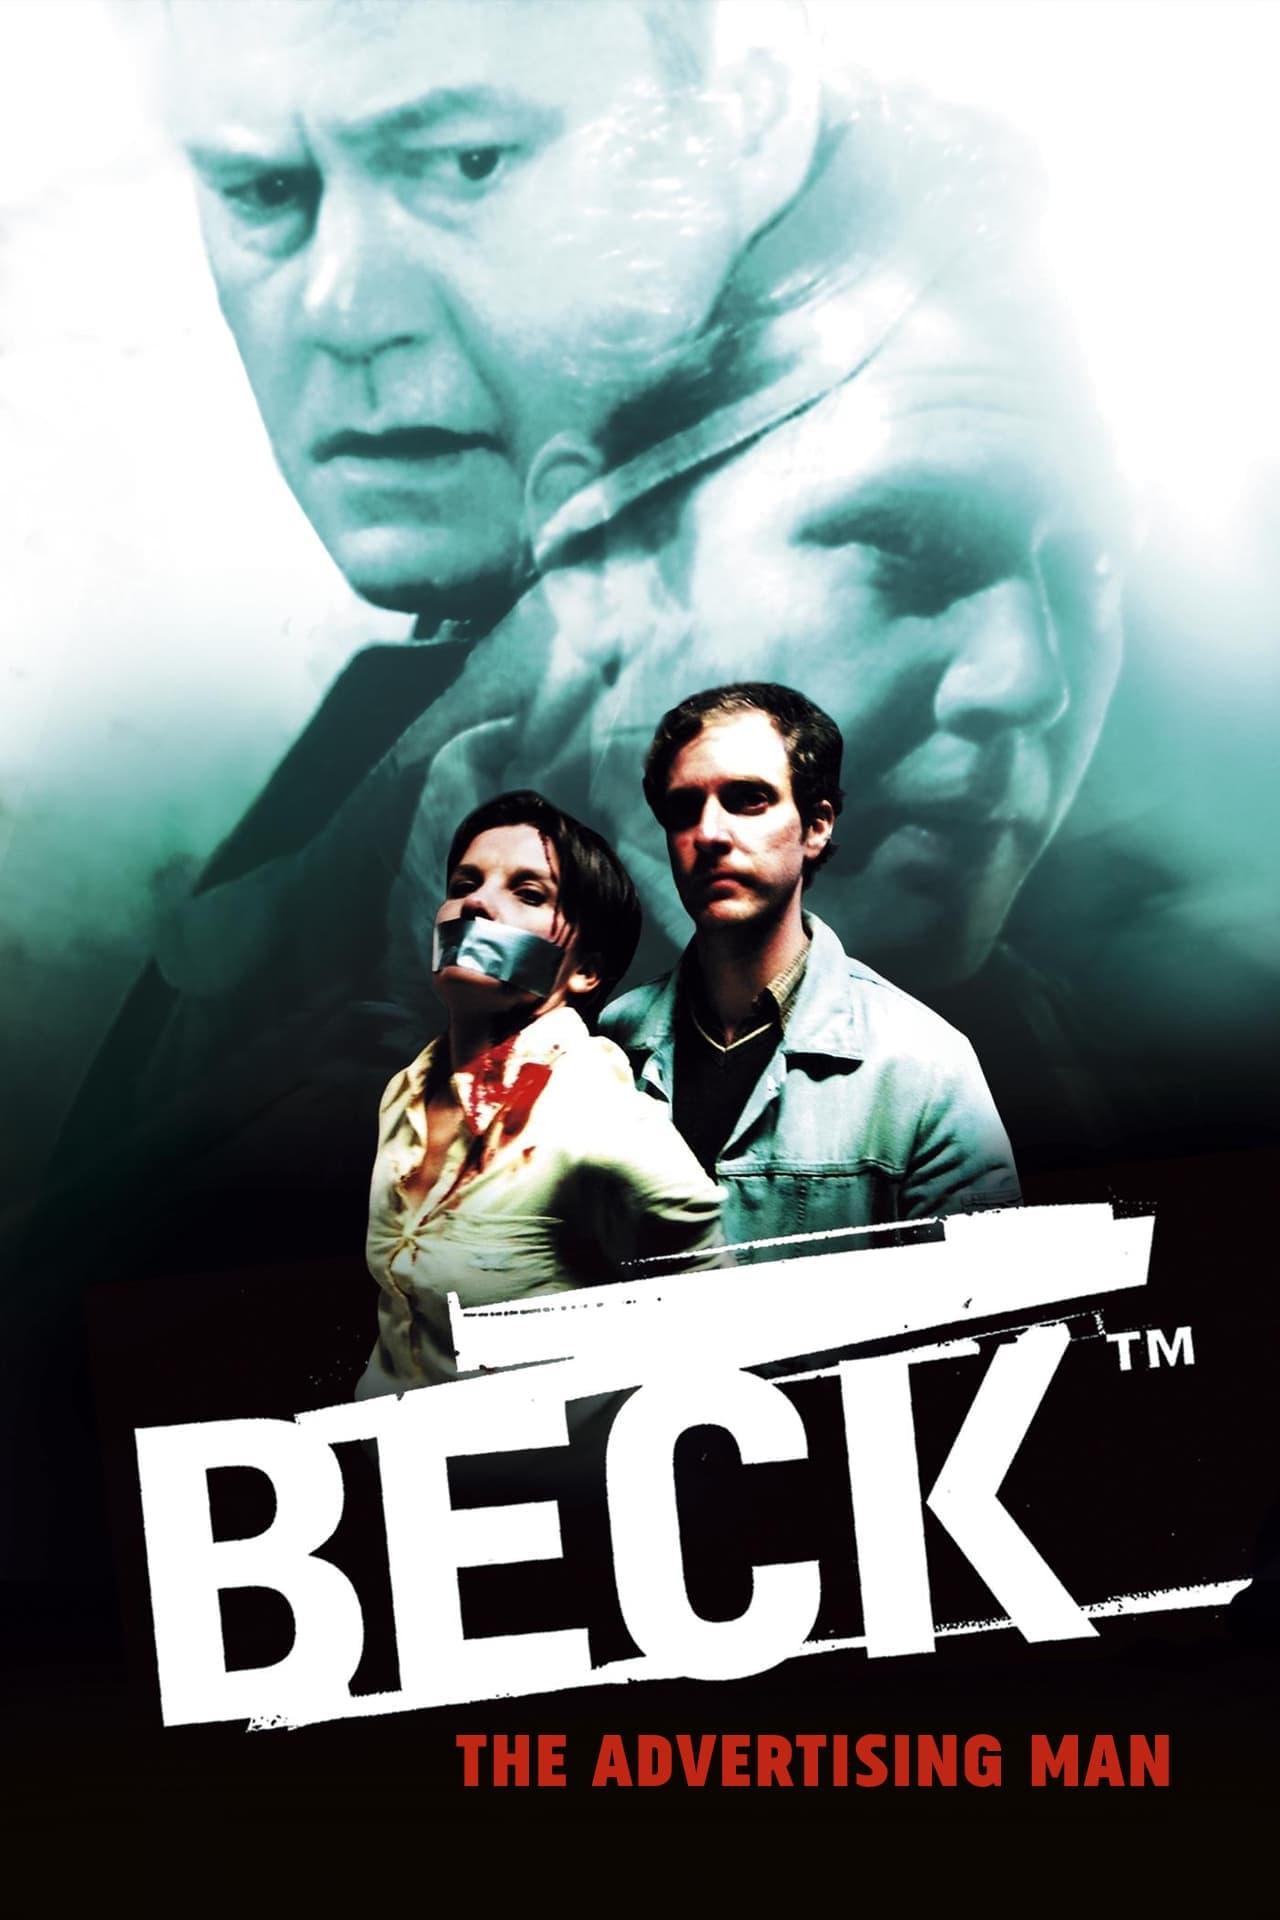 Beck 14 - The Advertising Man